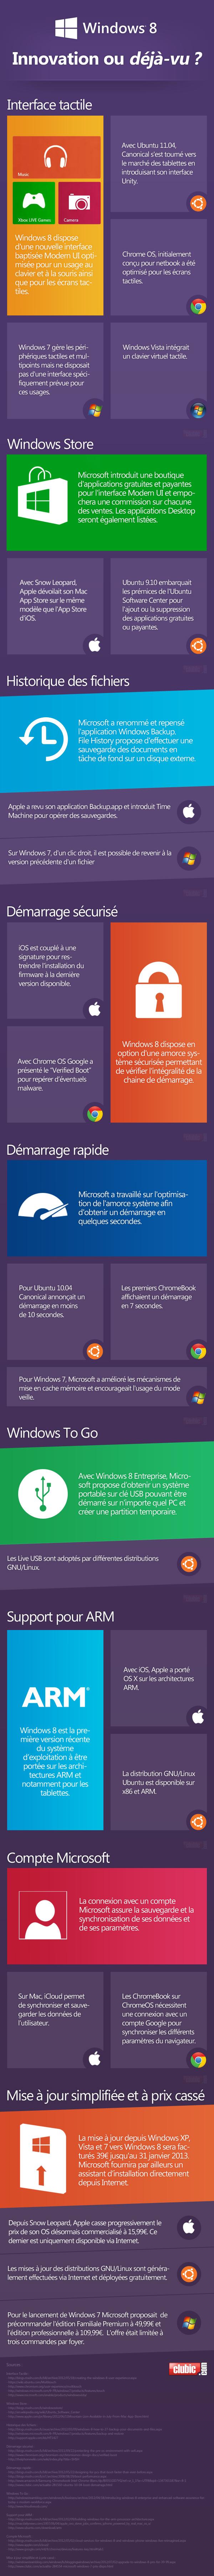 Infographie Windows 8